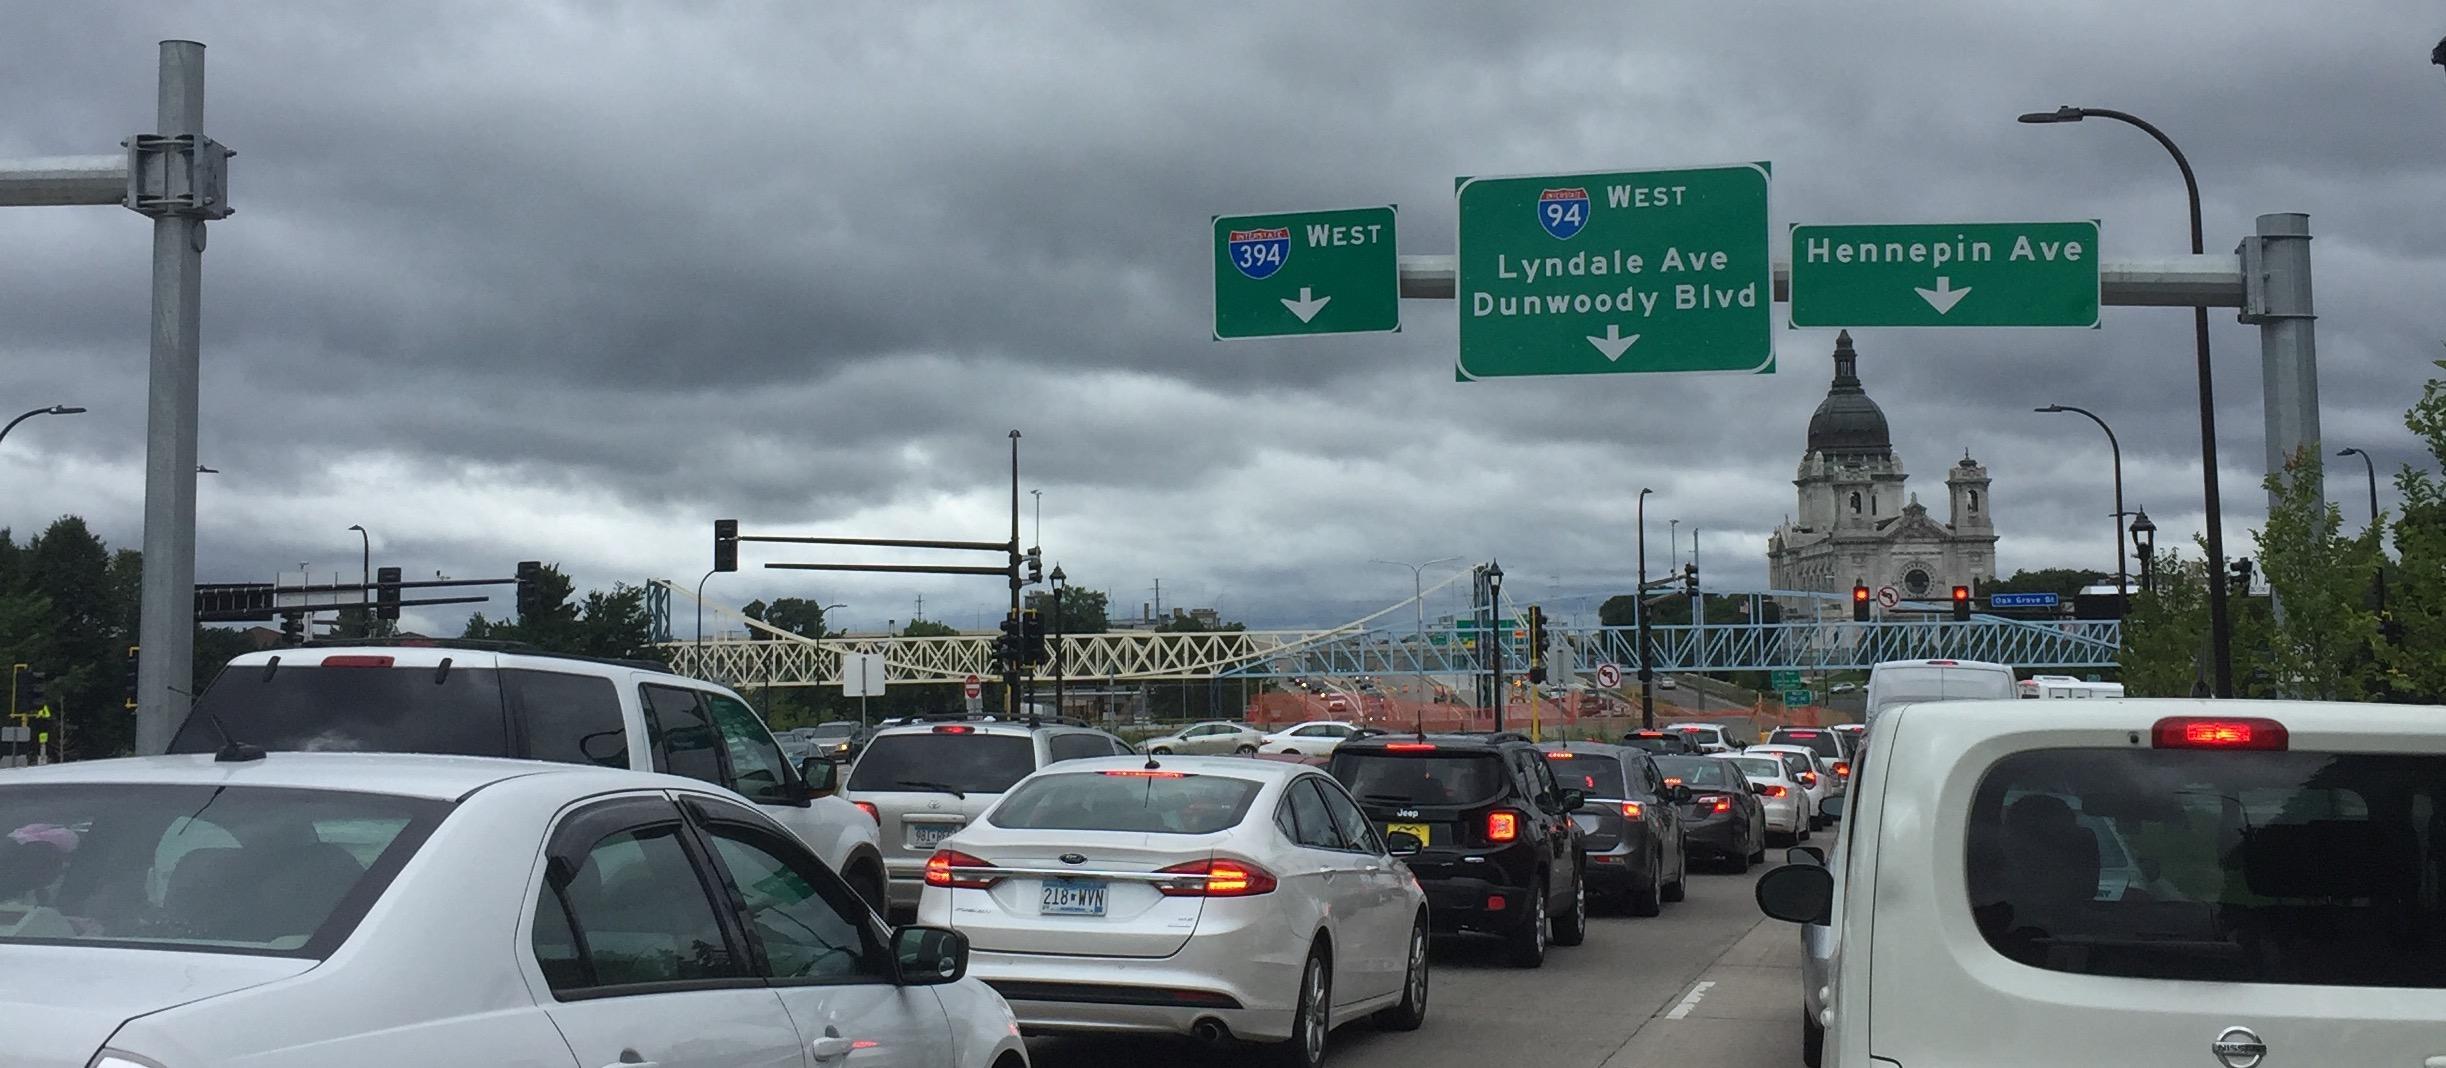 highways-byways.jpg